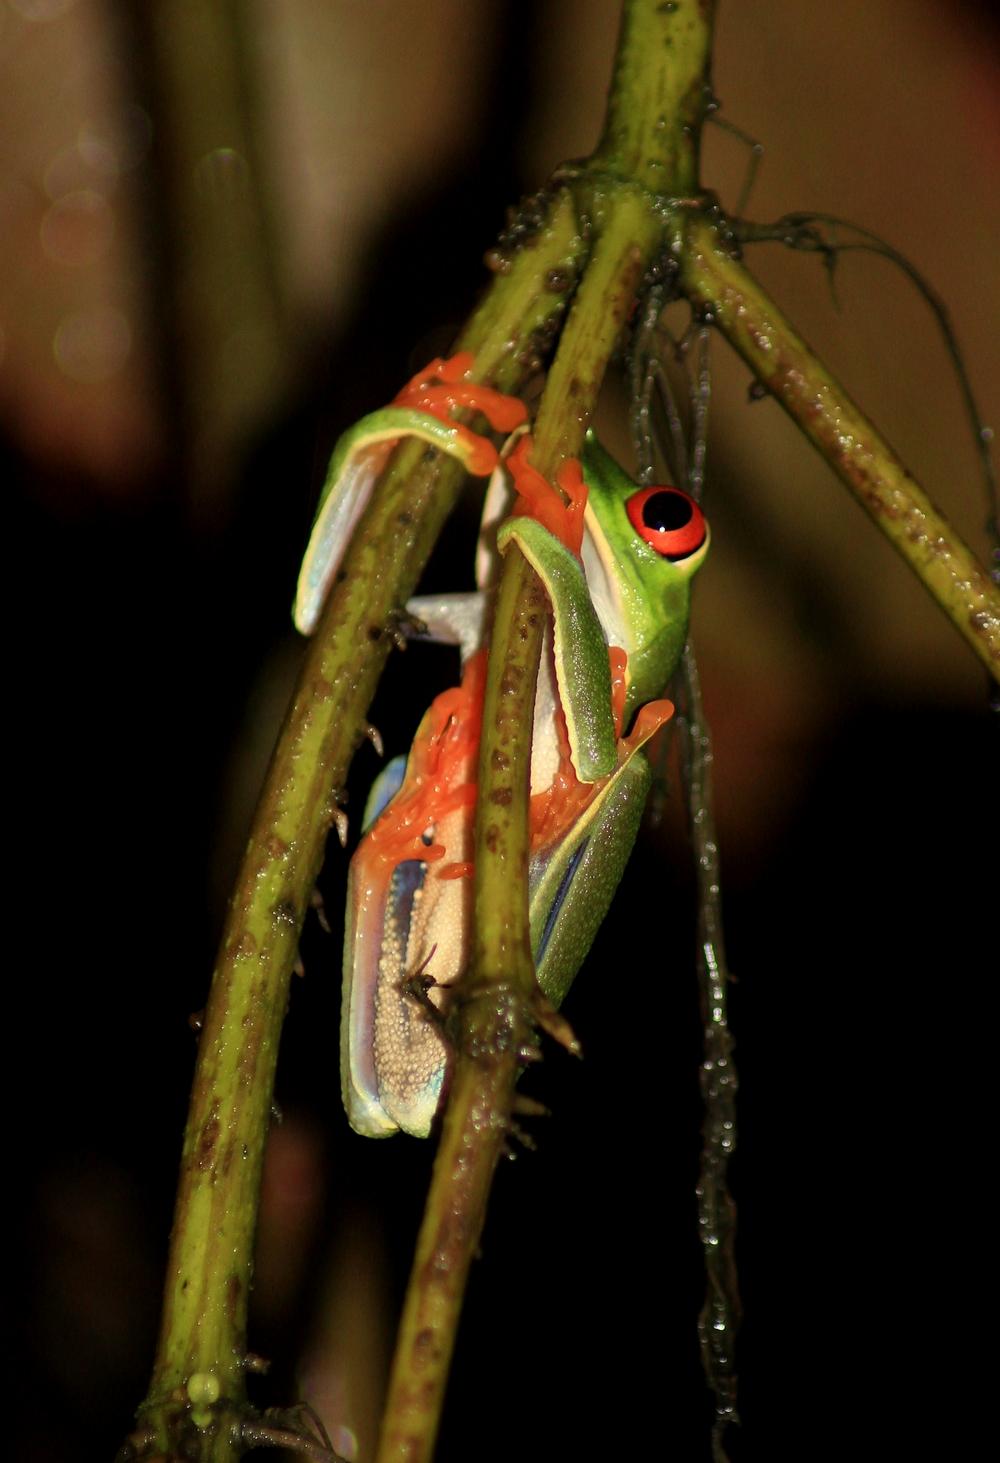 15 jours dans la jungle du Costa Rica 959733aga5r